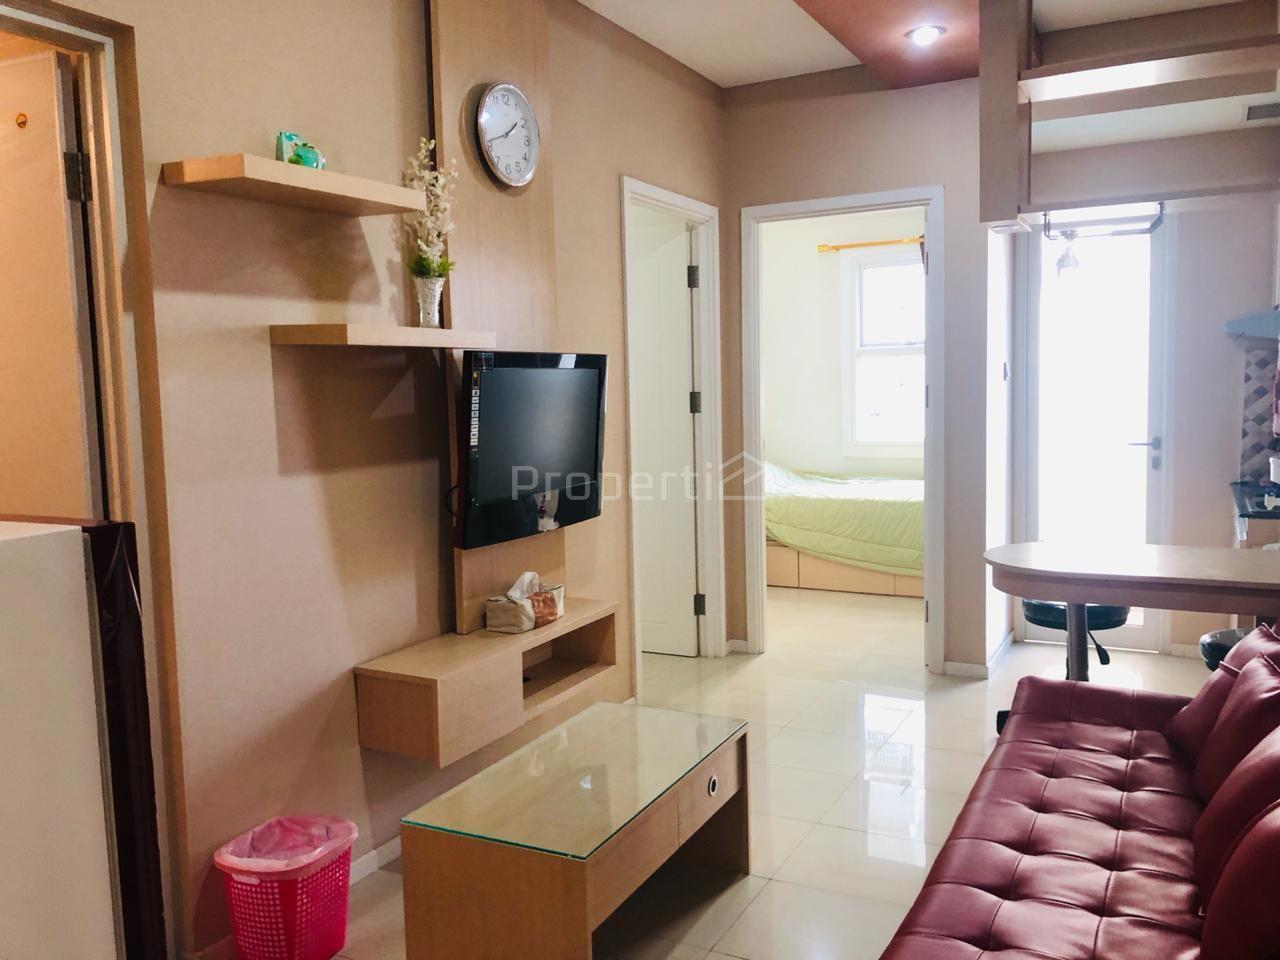 1BR Apartment Unit at Parahyangan Residences, 3rd Floor, Jawa Barat